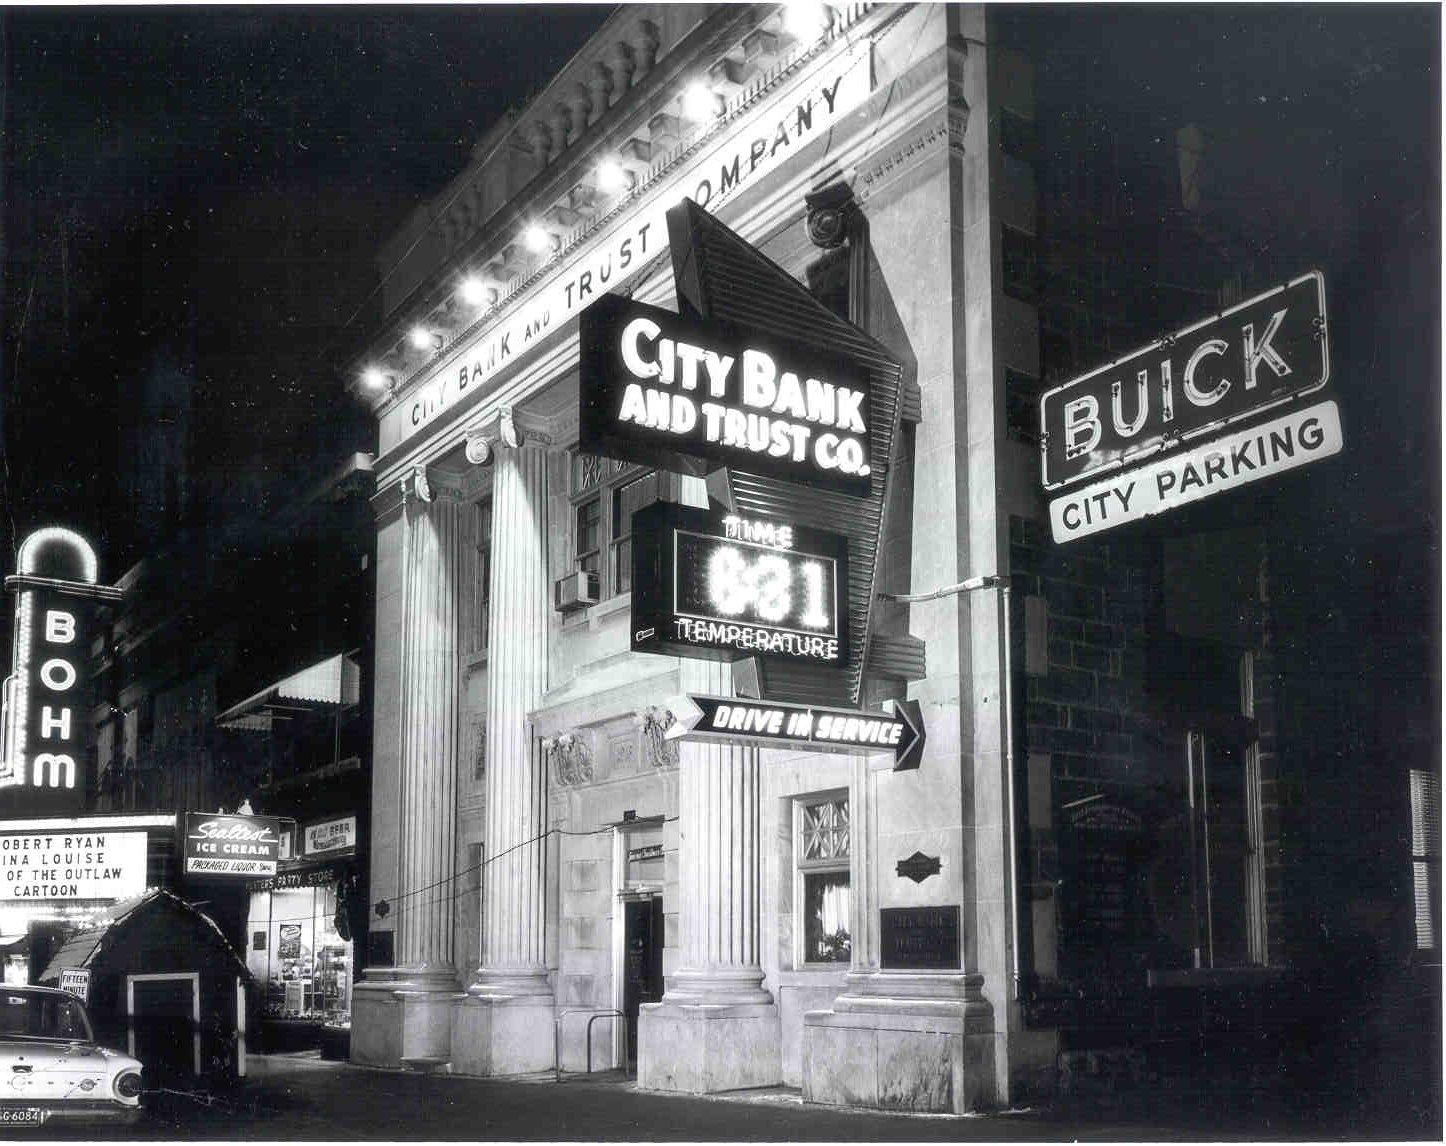 CITIZEN'S BANK TEMPERATURE SIGN - Historical Albion Michigan